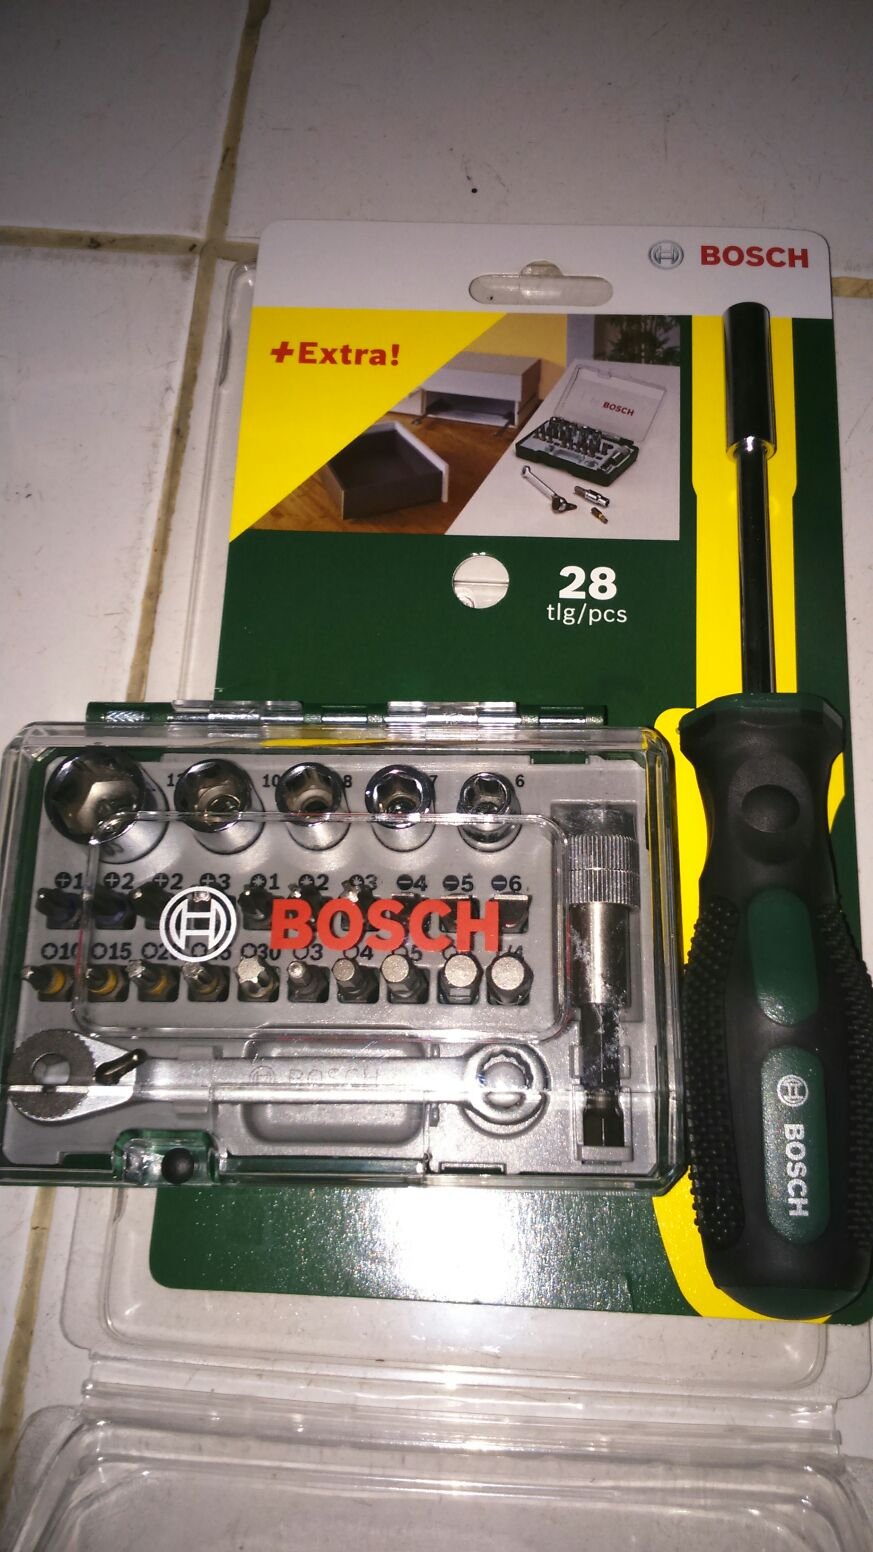 Jual Obeng Set Tokopedia Welcome To Sok T Bosch Kunci Mini Mata 28 Pcs